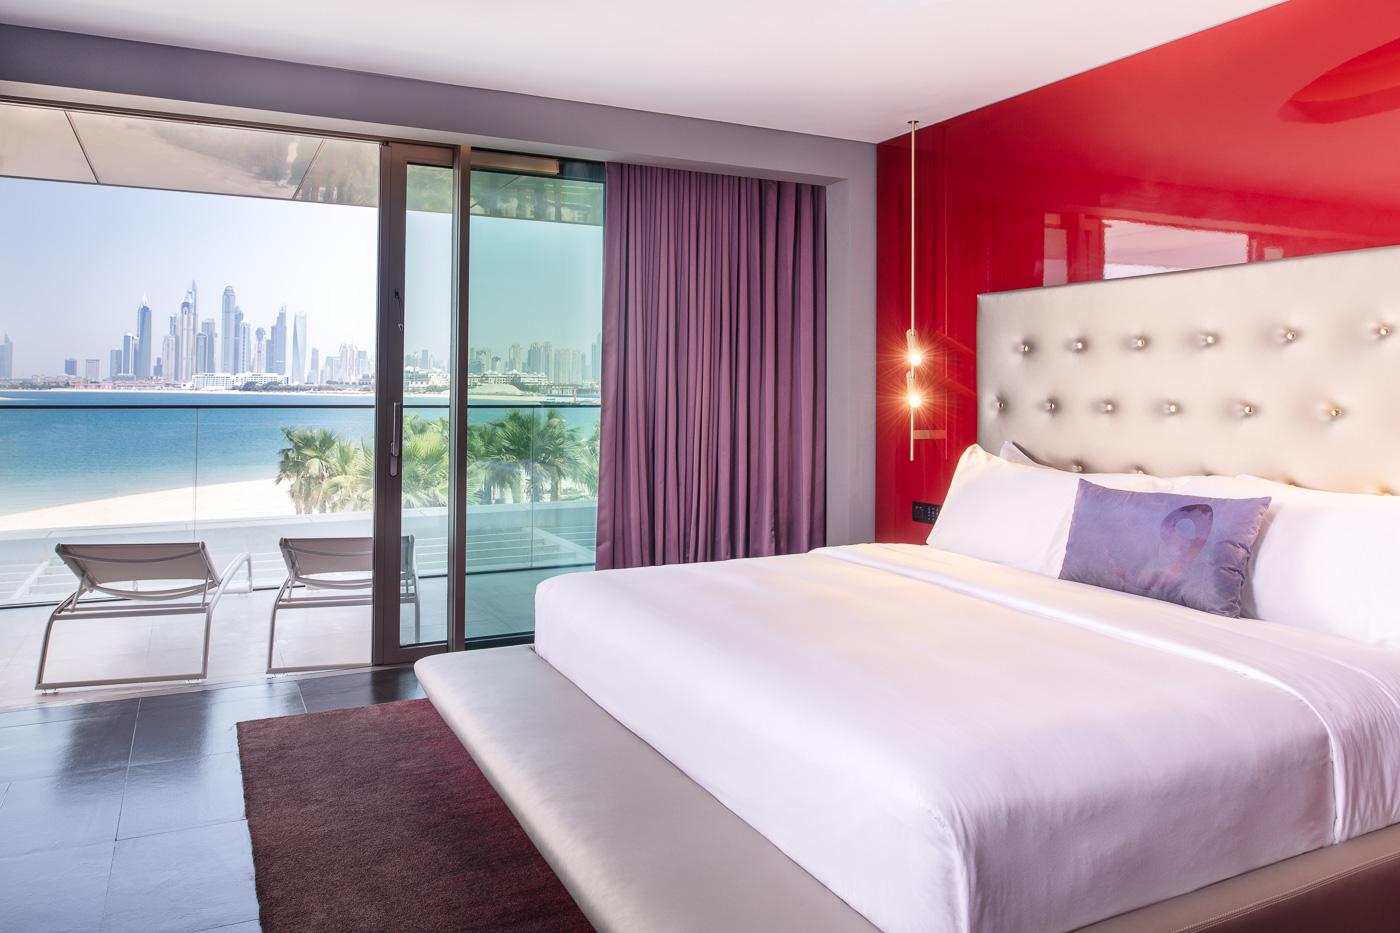 W Hotel The Palm Dubai